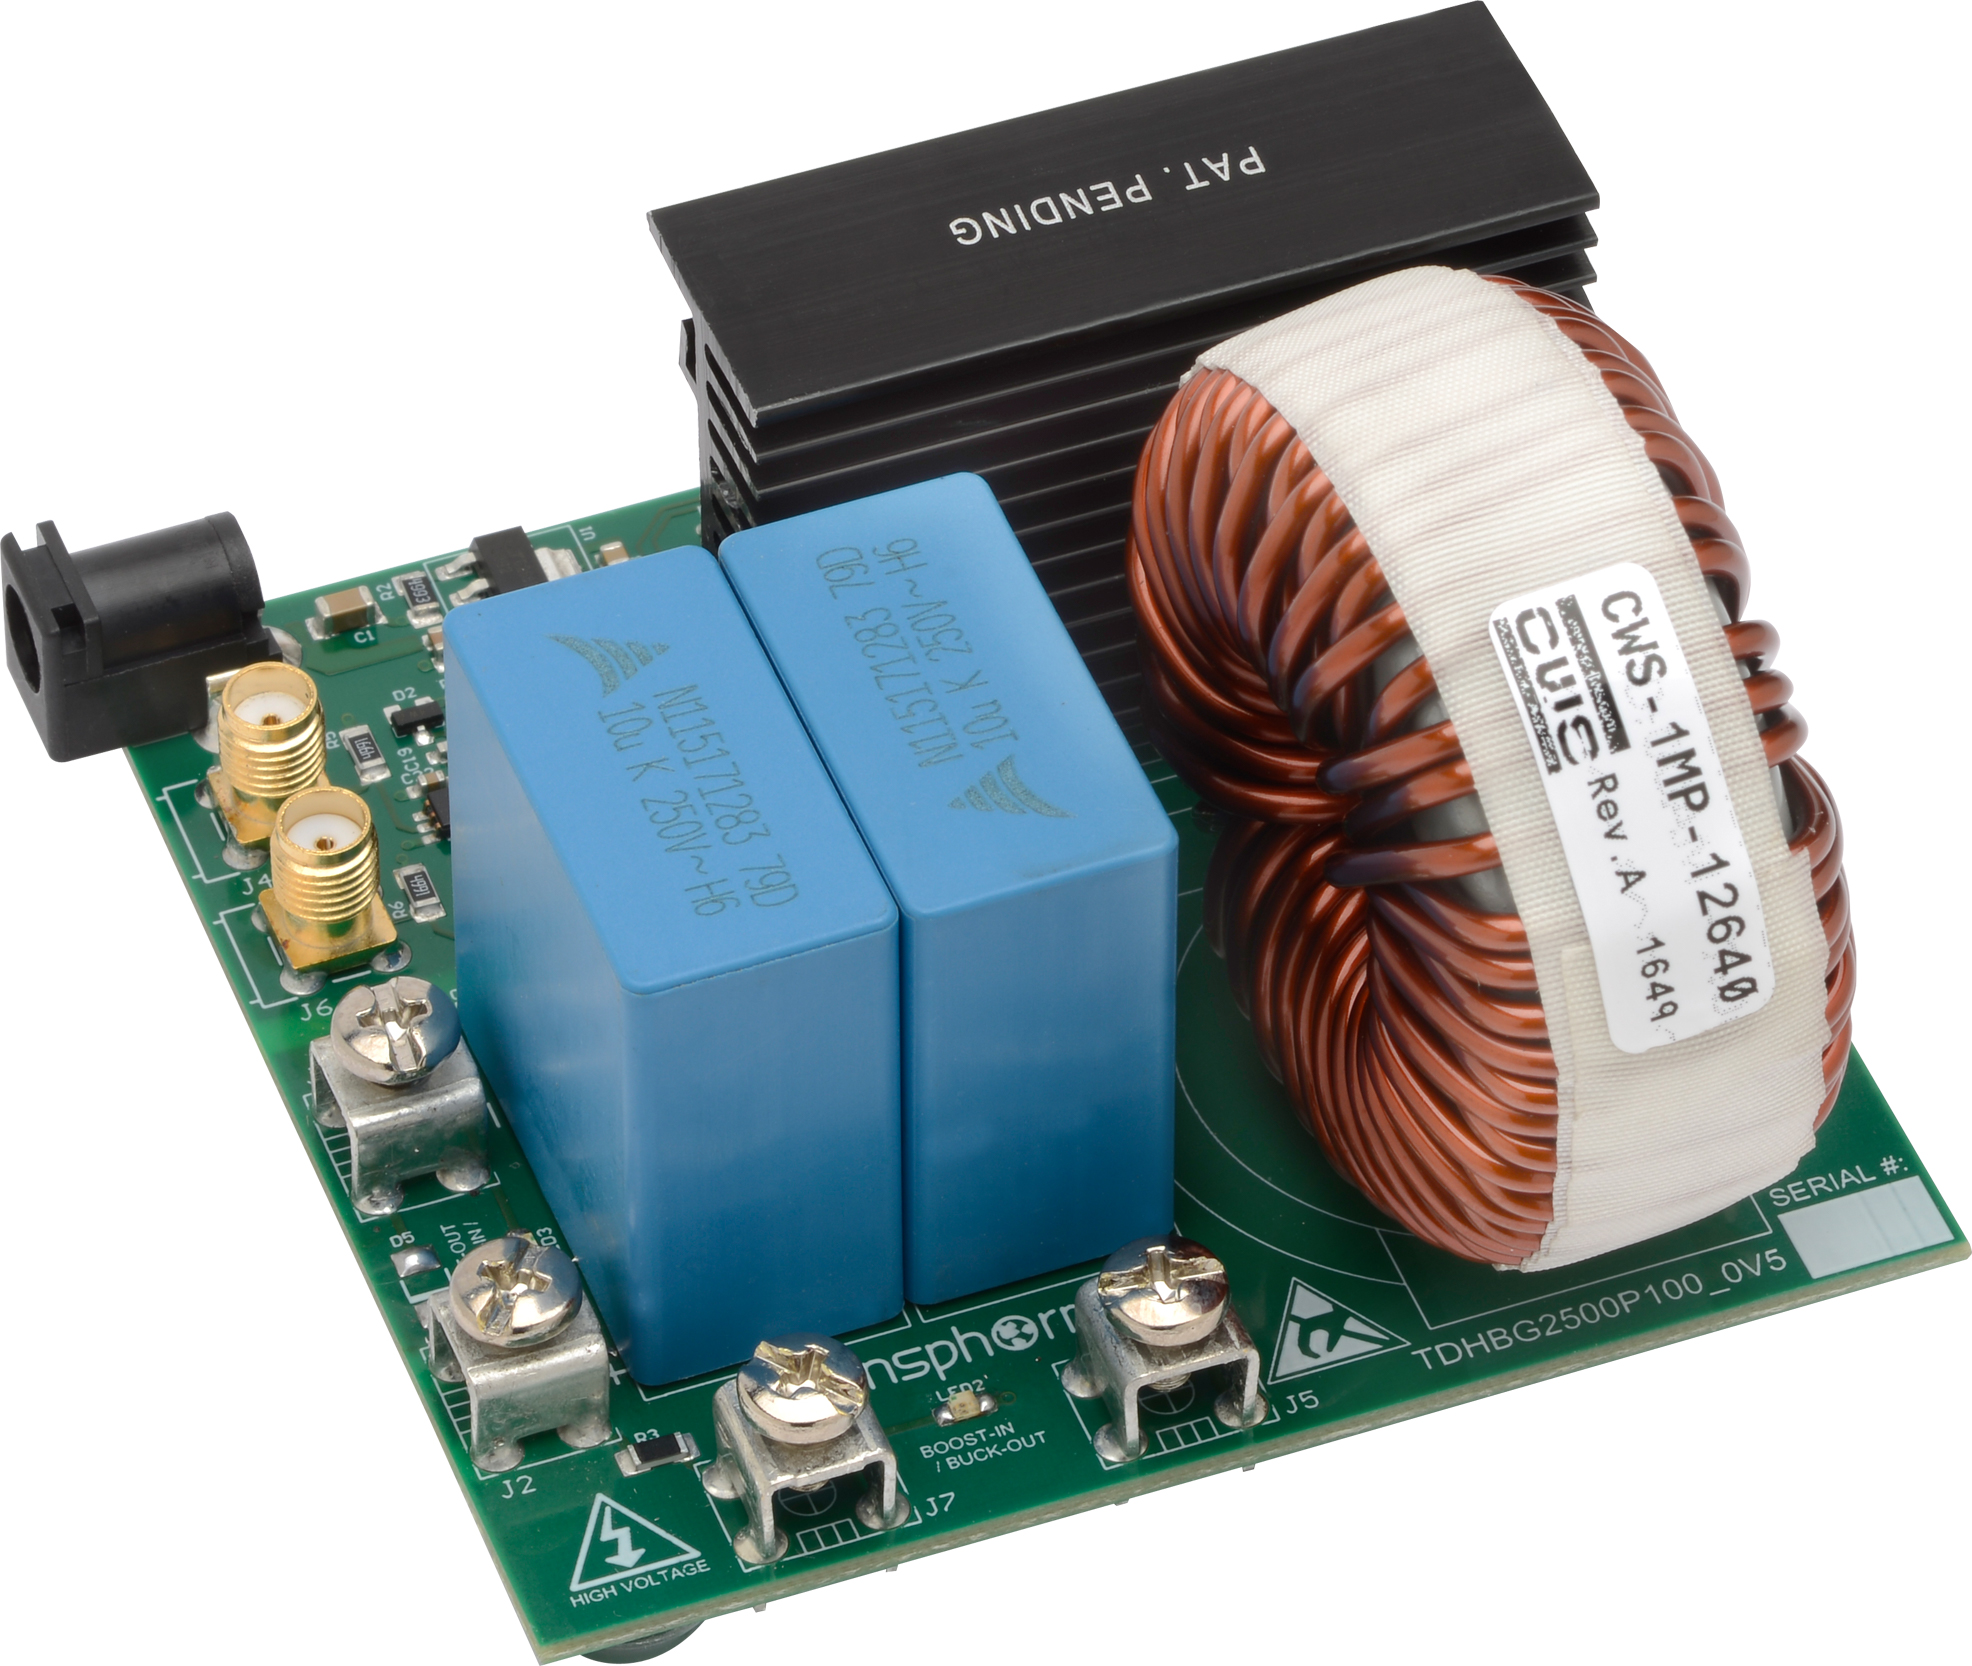 Gan Evaluation Kit Tdhbg2500p100 25kw Hb Buck Boost Transphorm Blue Circuit Board Label Previous